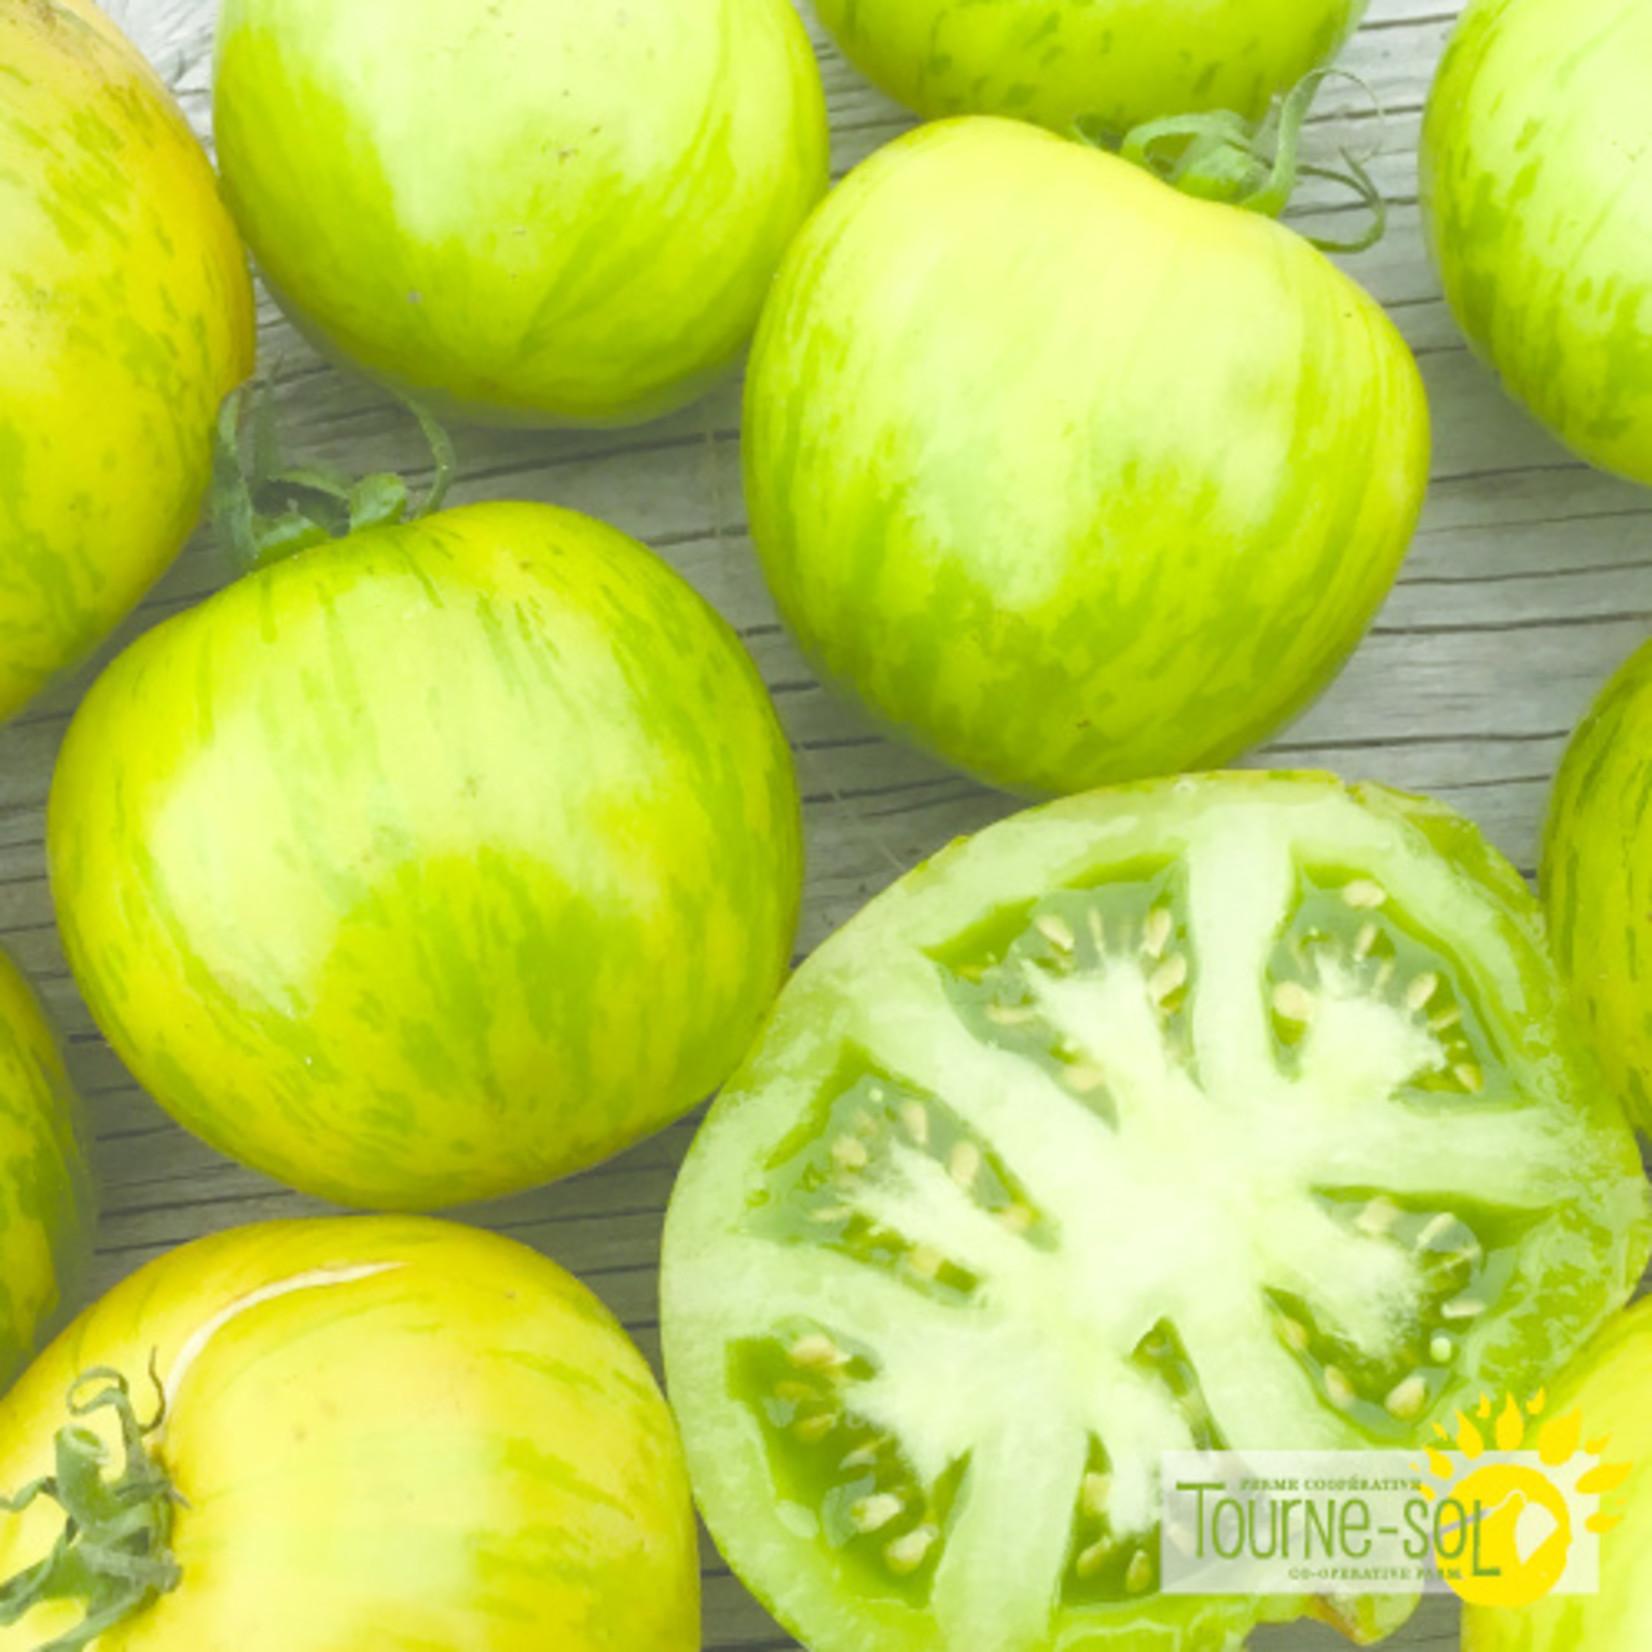 Tourne-Sol Tomate Verte Green Zebra